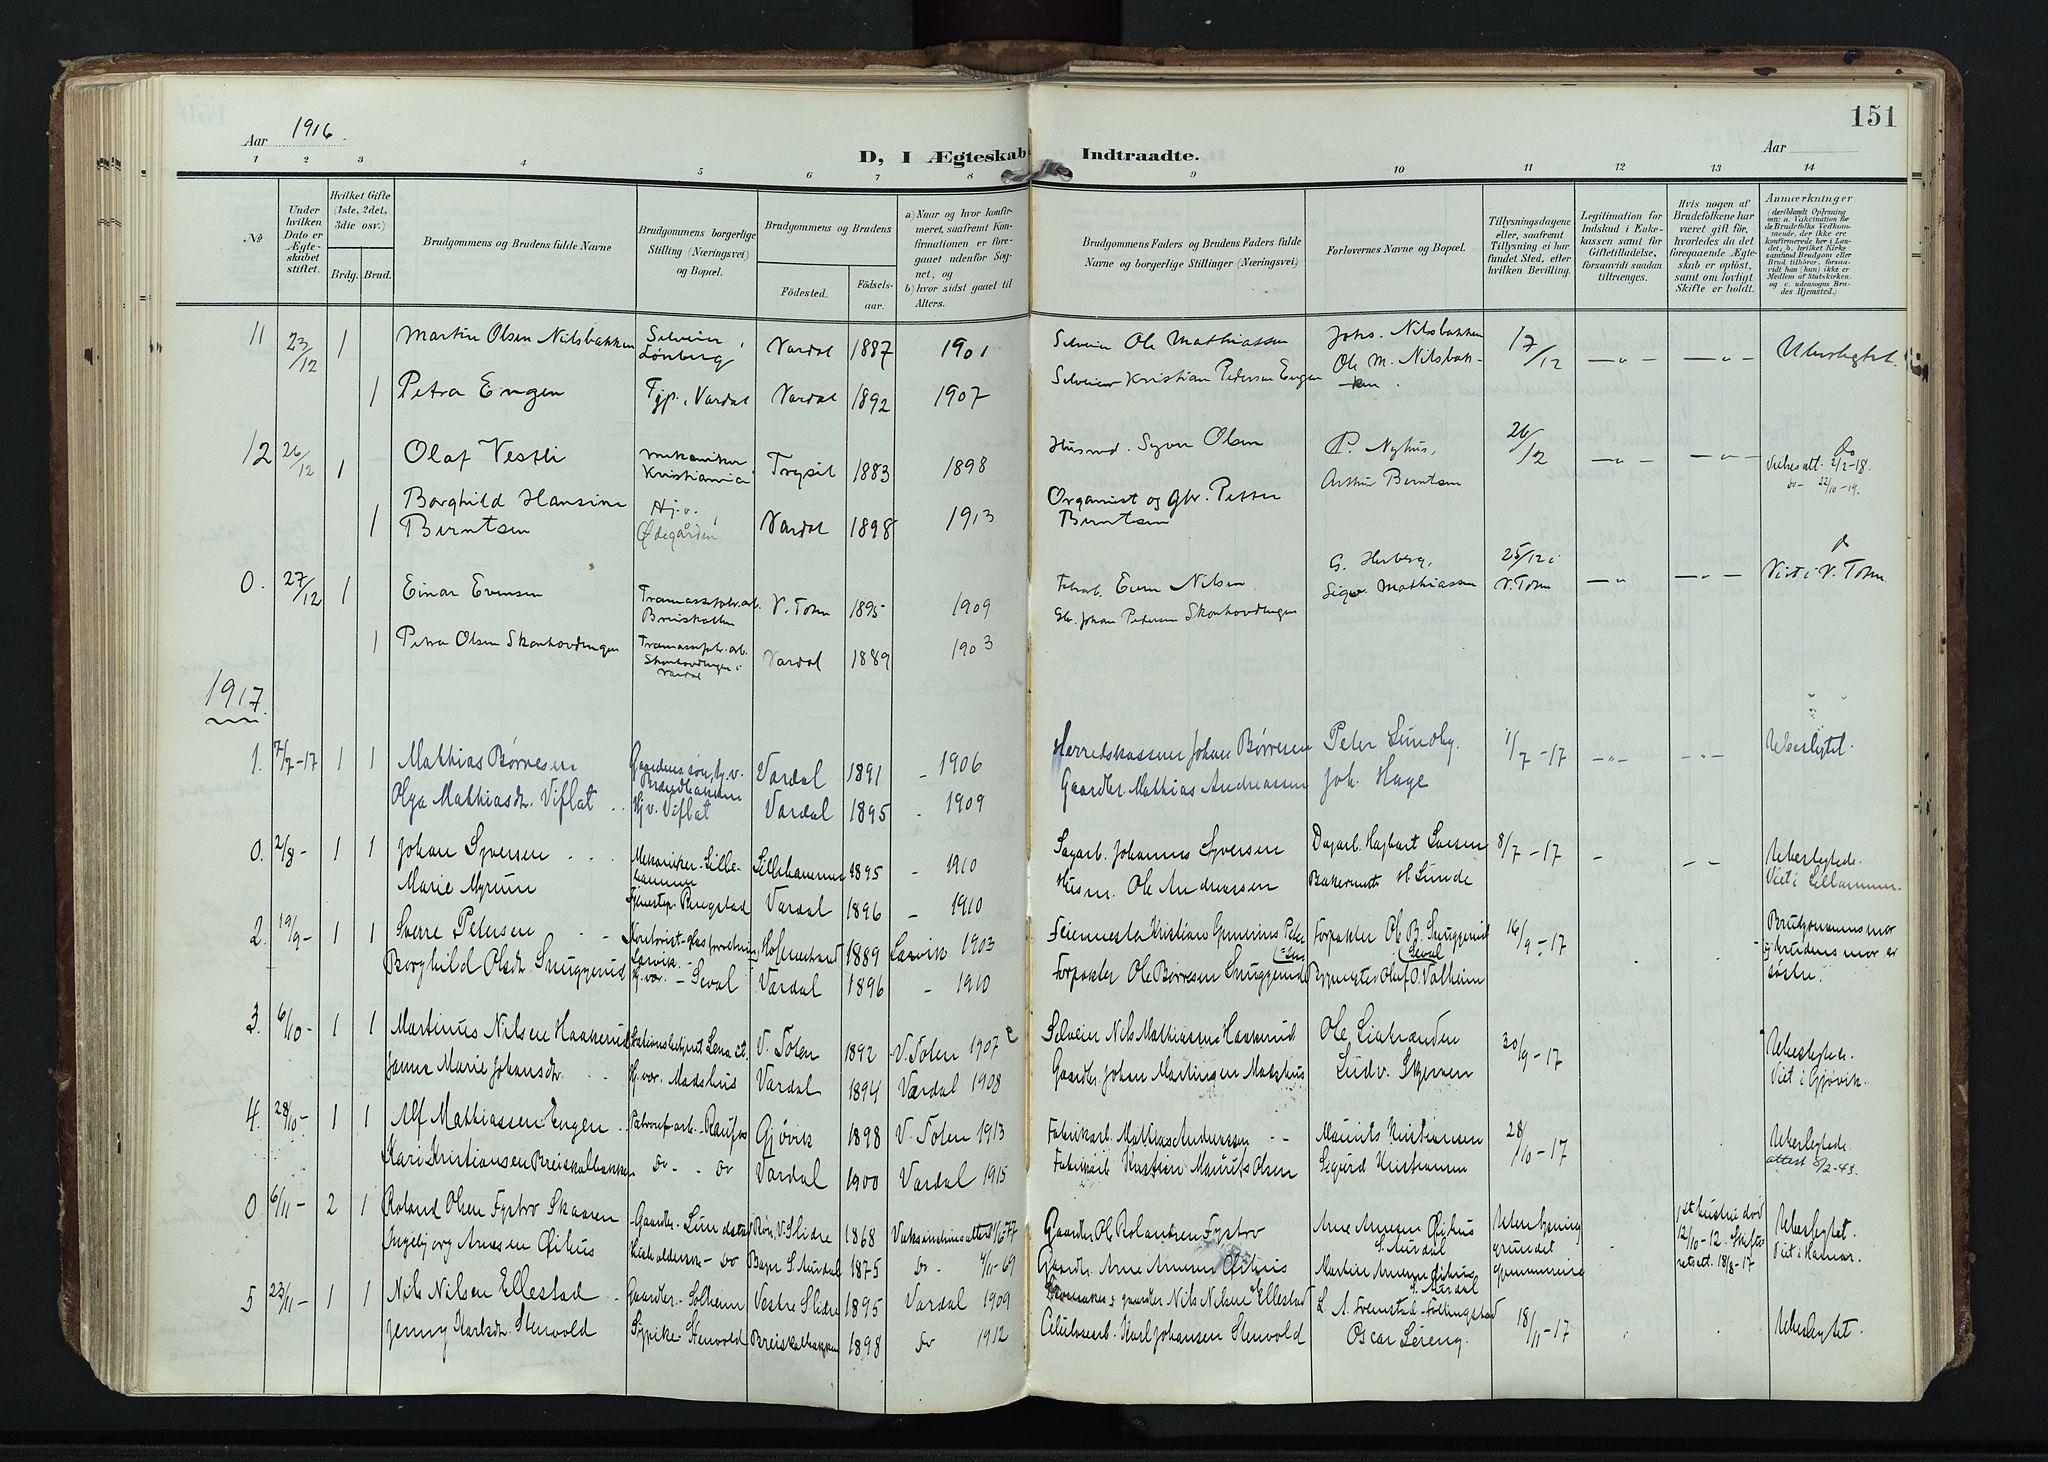 SAH, Vardal prestekontor, H/Ha/Haa/L0020: Ministerialbok nr. 20, 1907-1921, s. 151